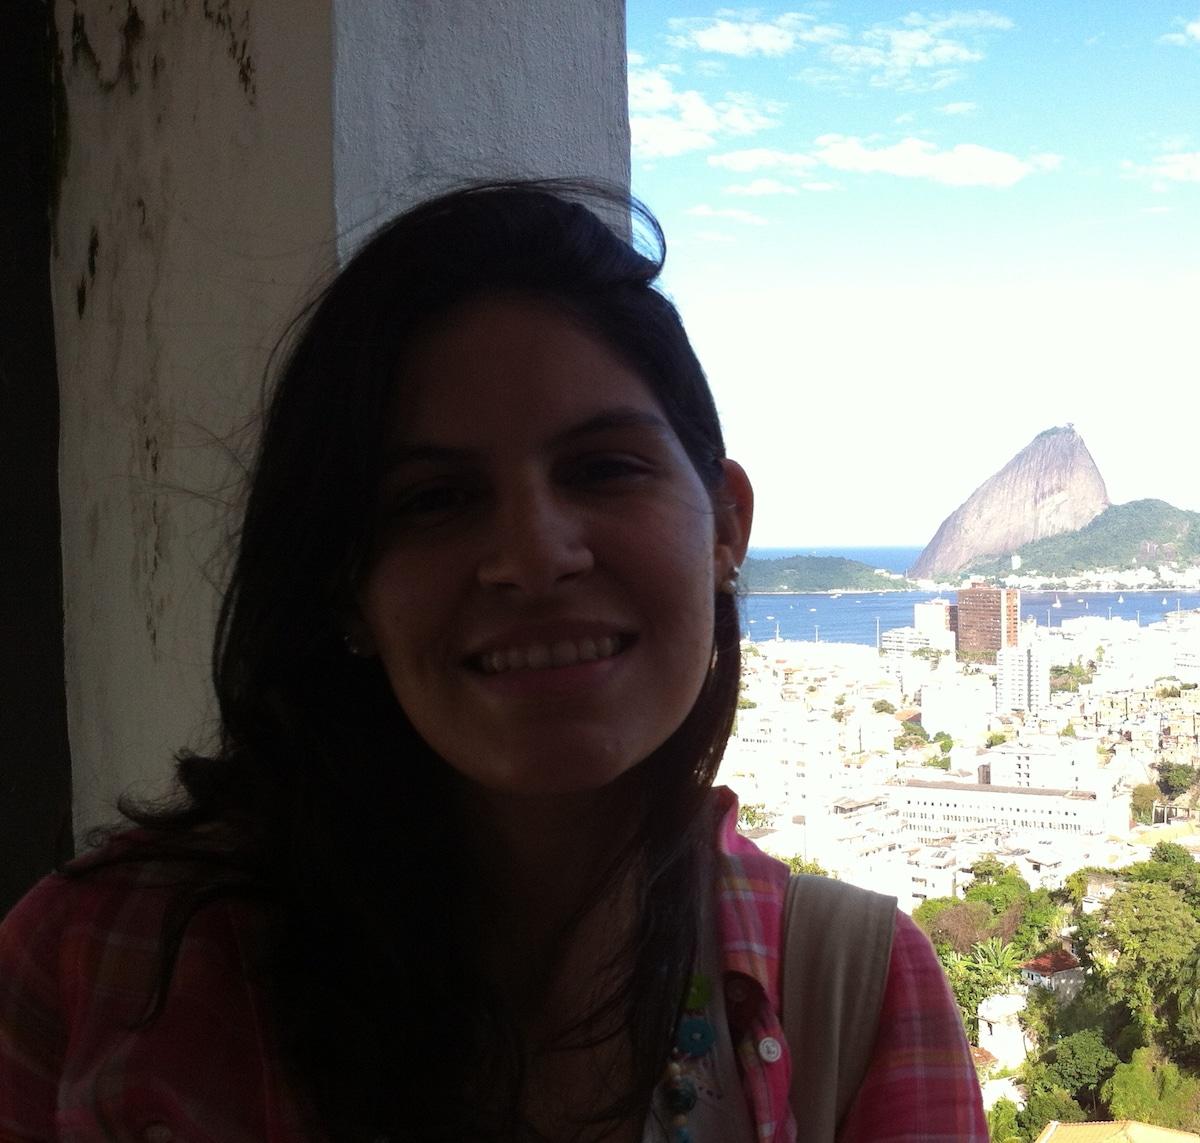 Raquel from Saquarema